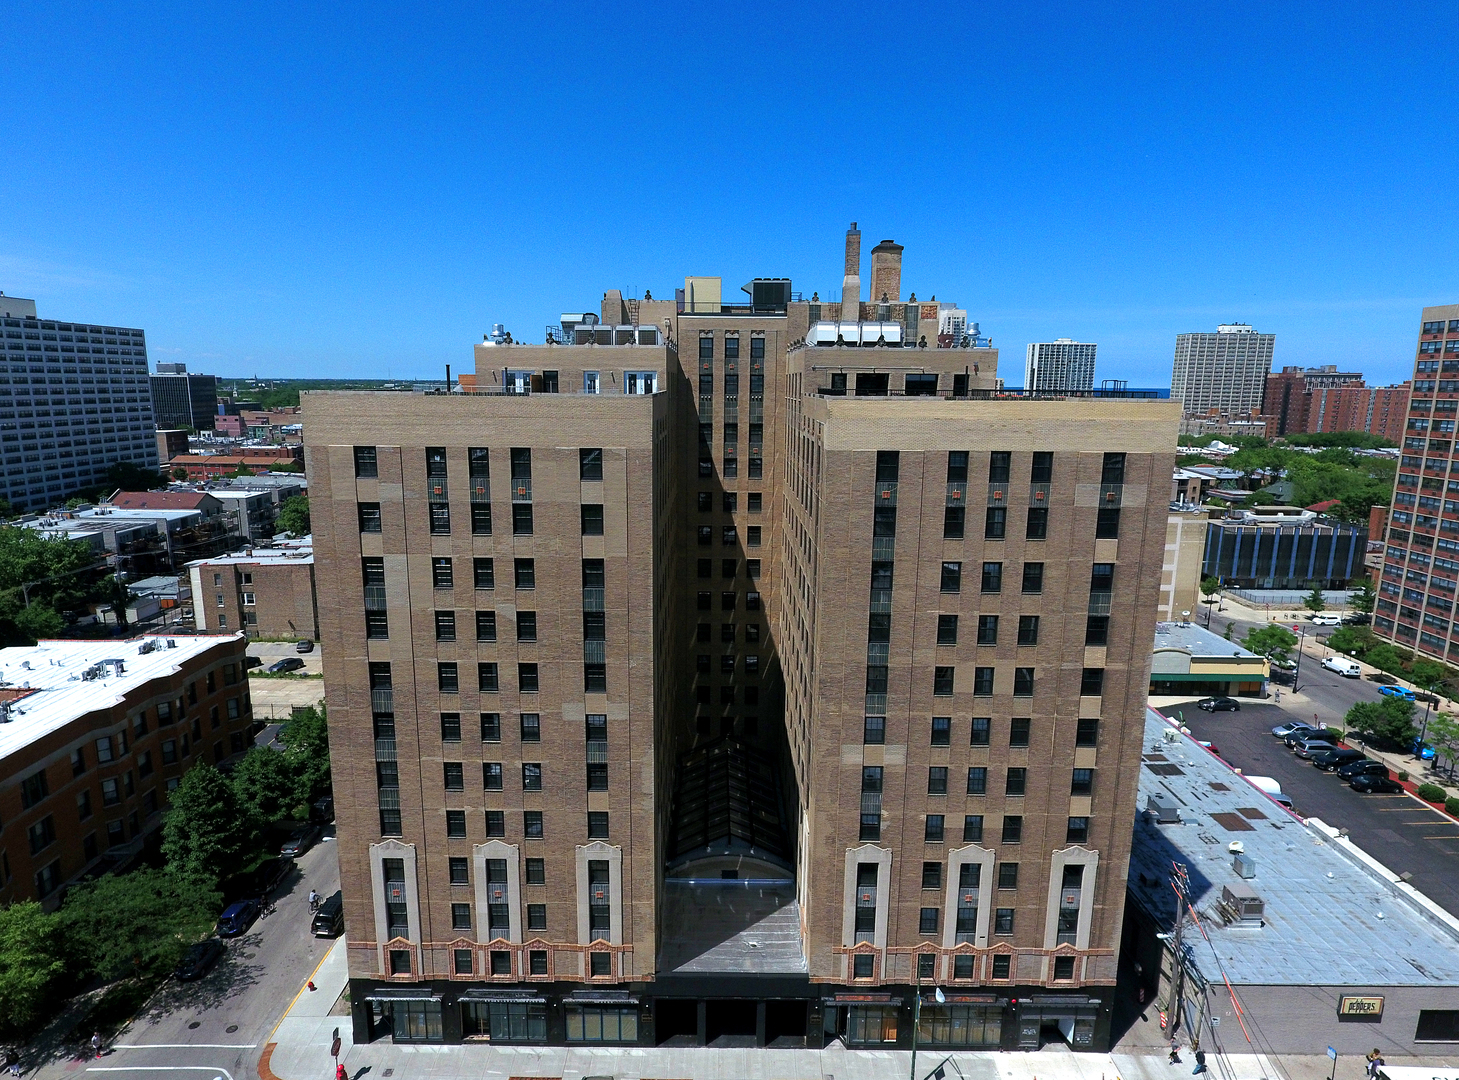 1020 Lawrence Unit Unit 1307 ,Chicago, Illinois 60640